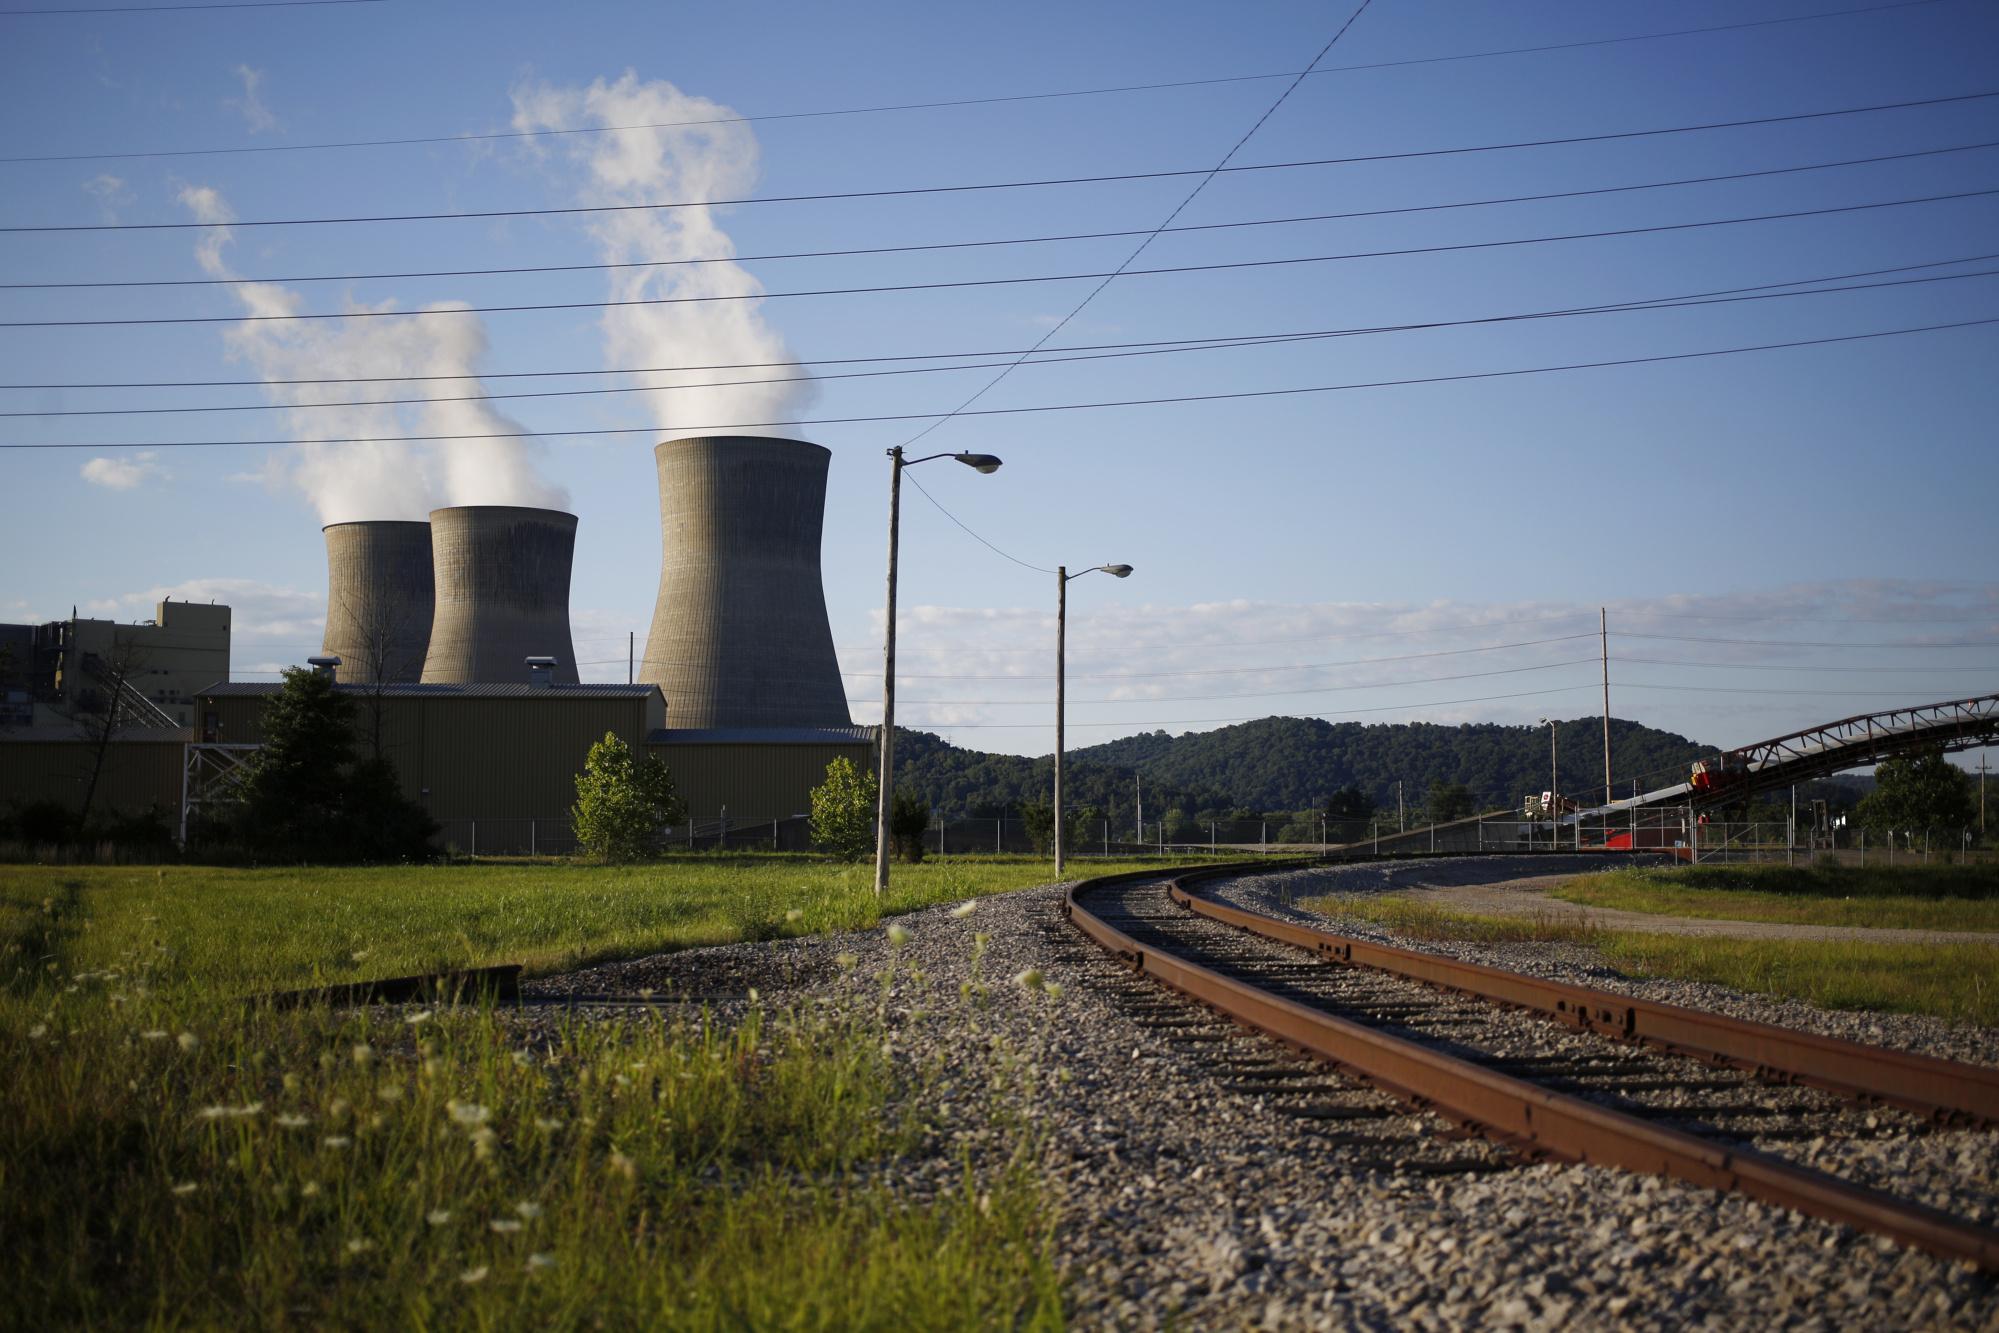 The AEP Coal-Fired John E. Amos Power Plant As EPA Reviews MATS